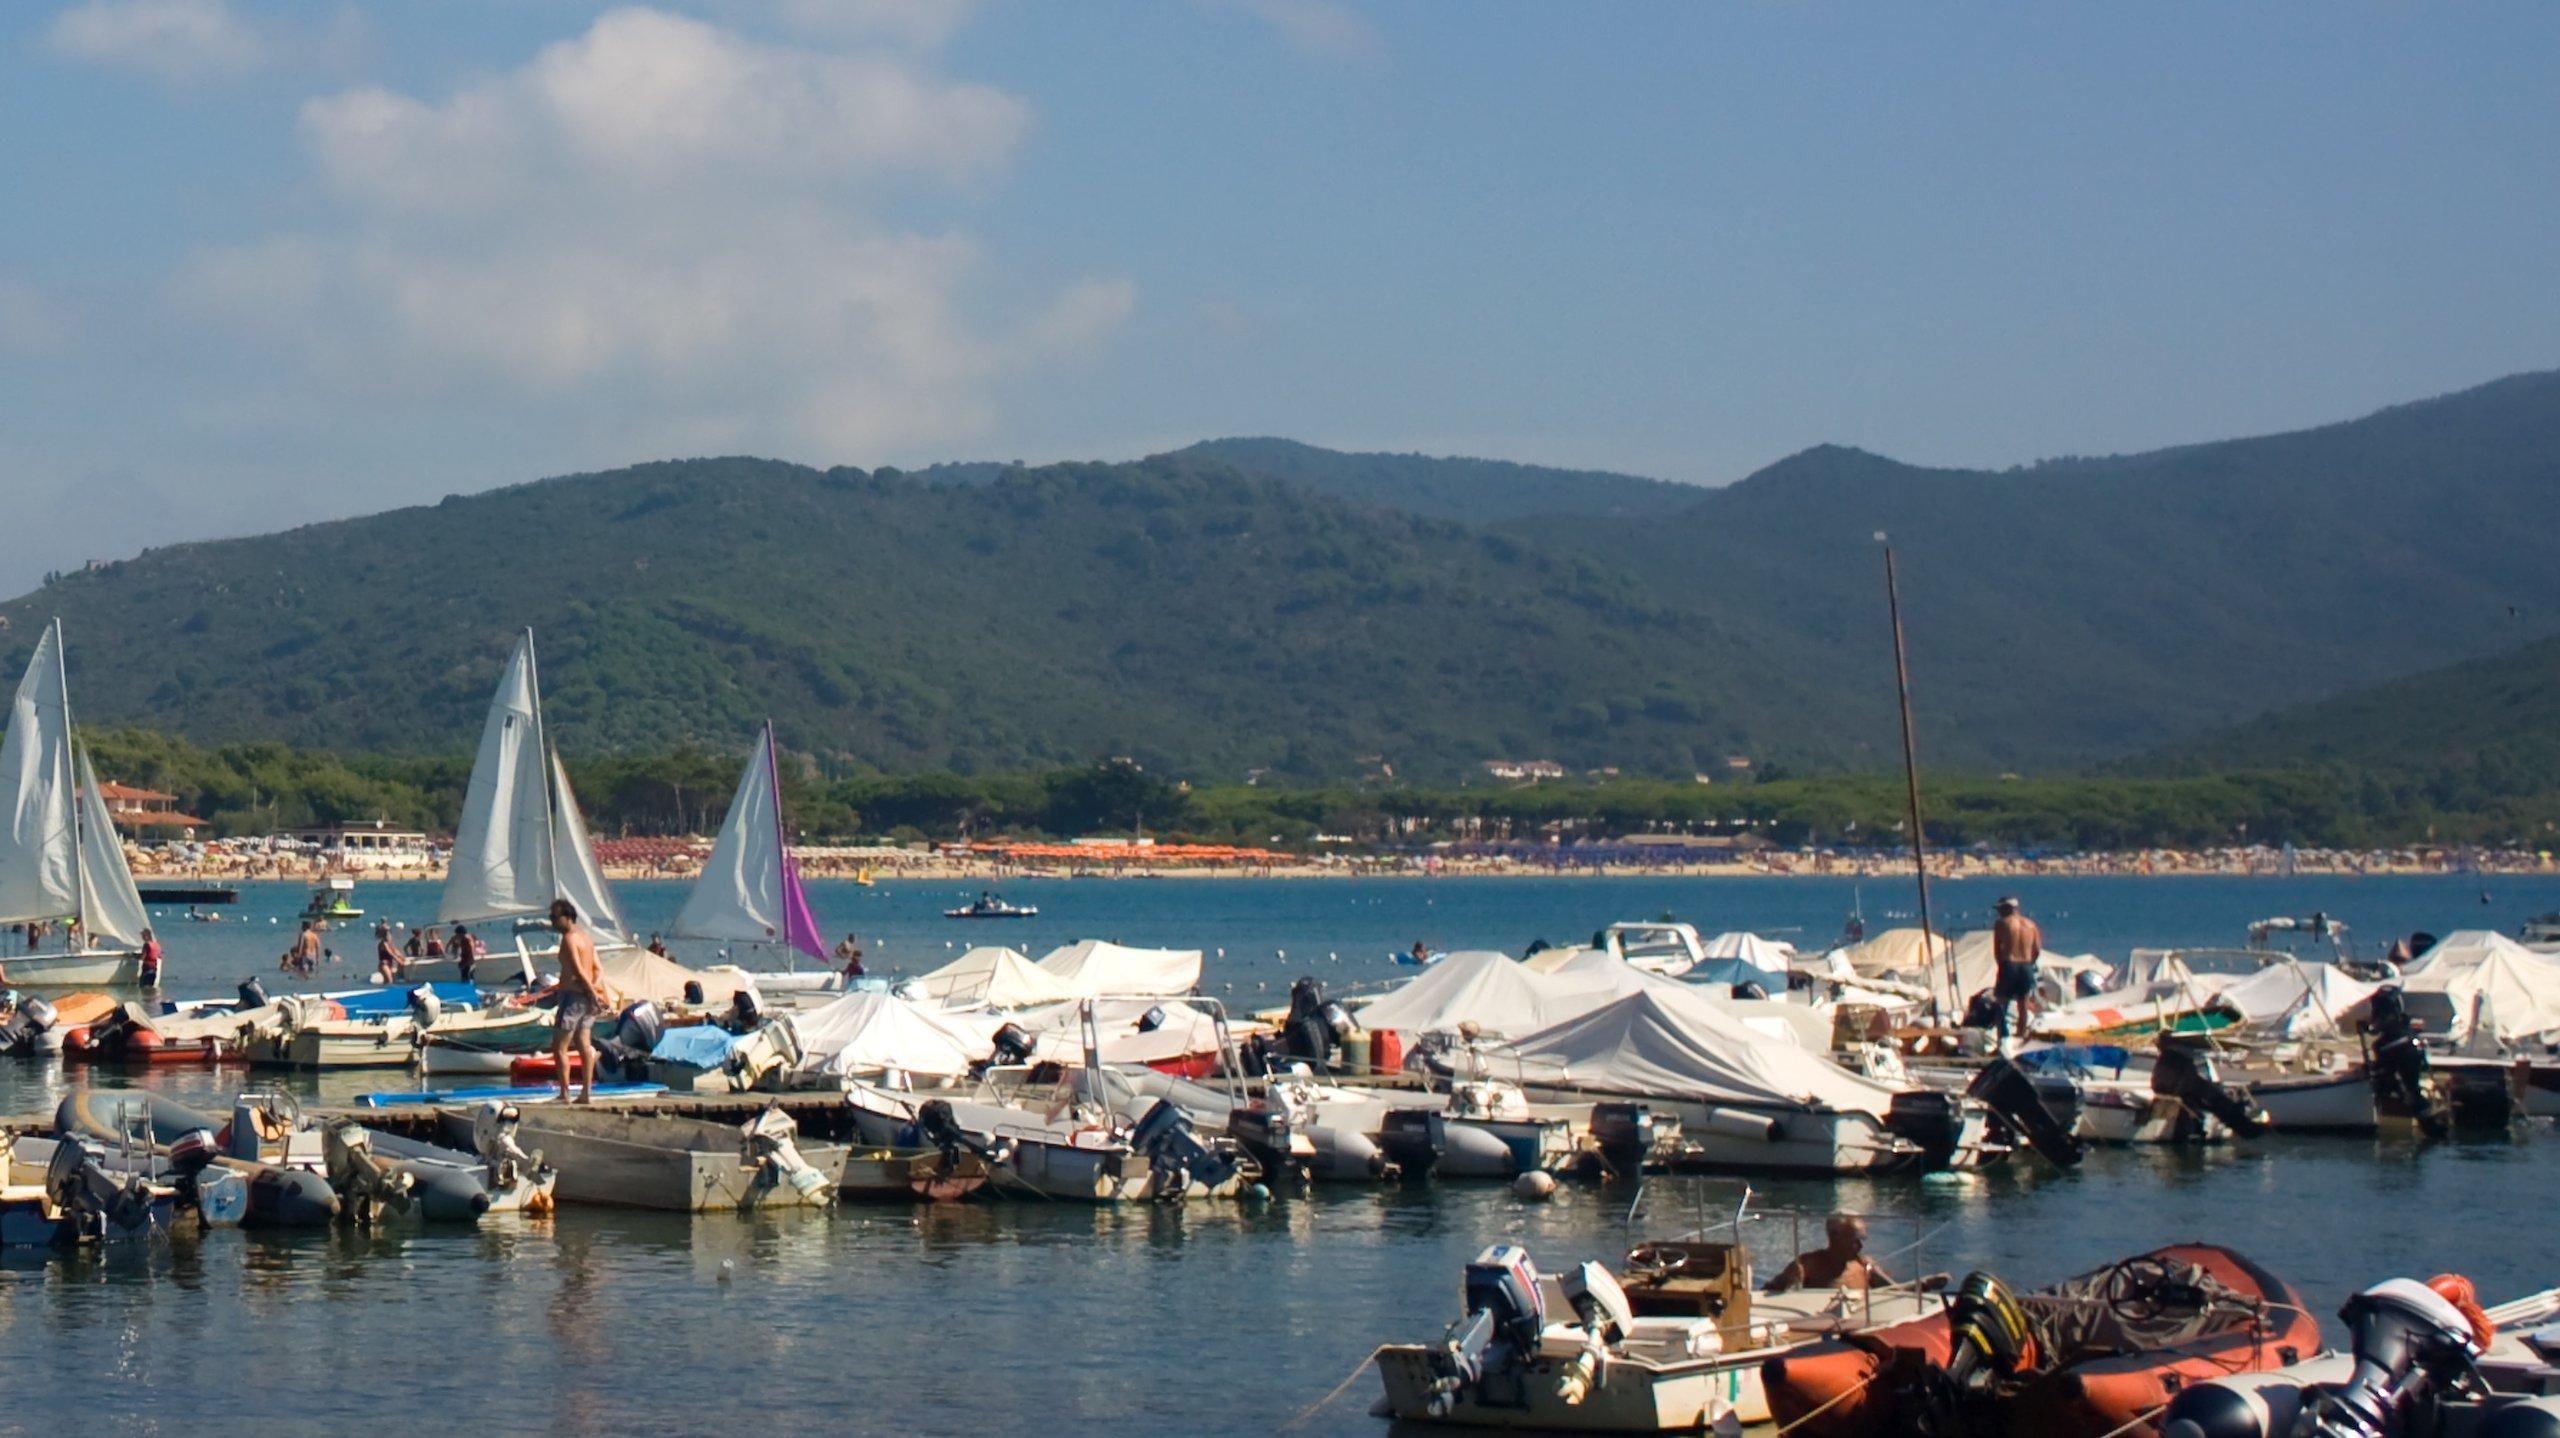 Marina di Campo, Campo nell'Elba, Toskana, Italien